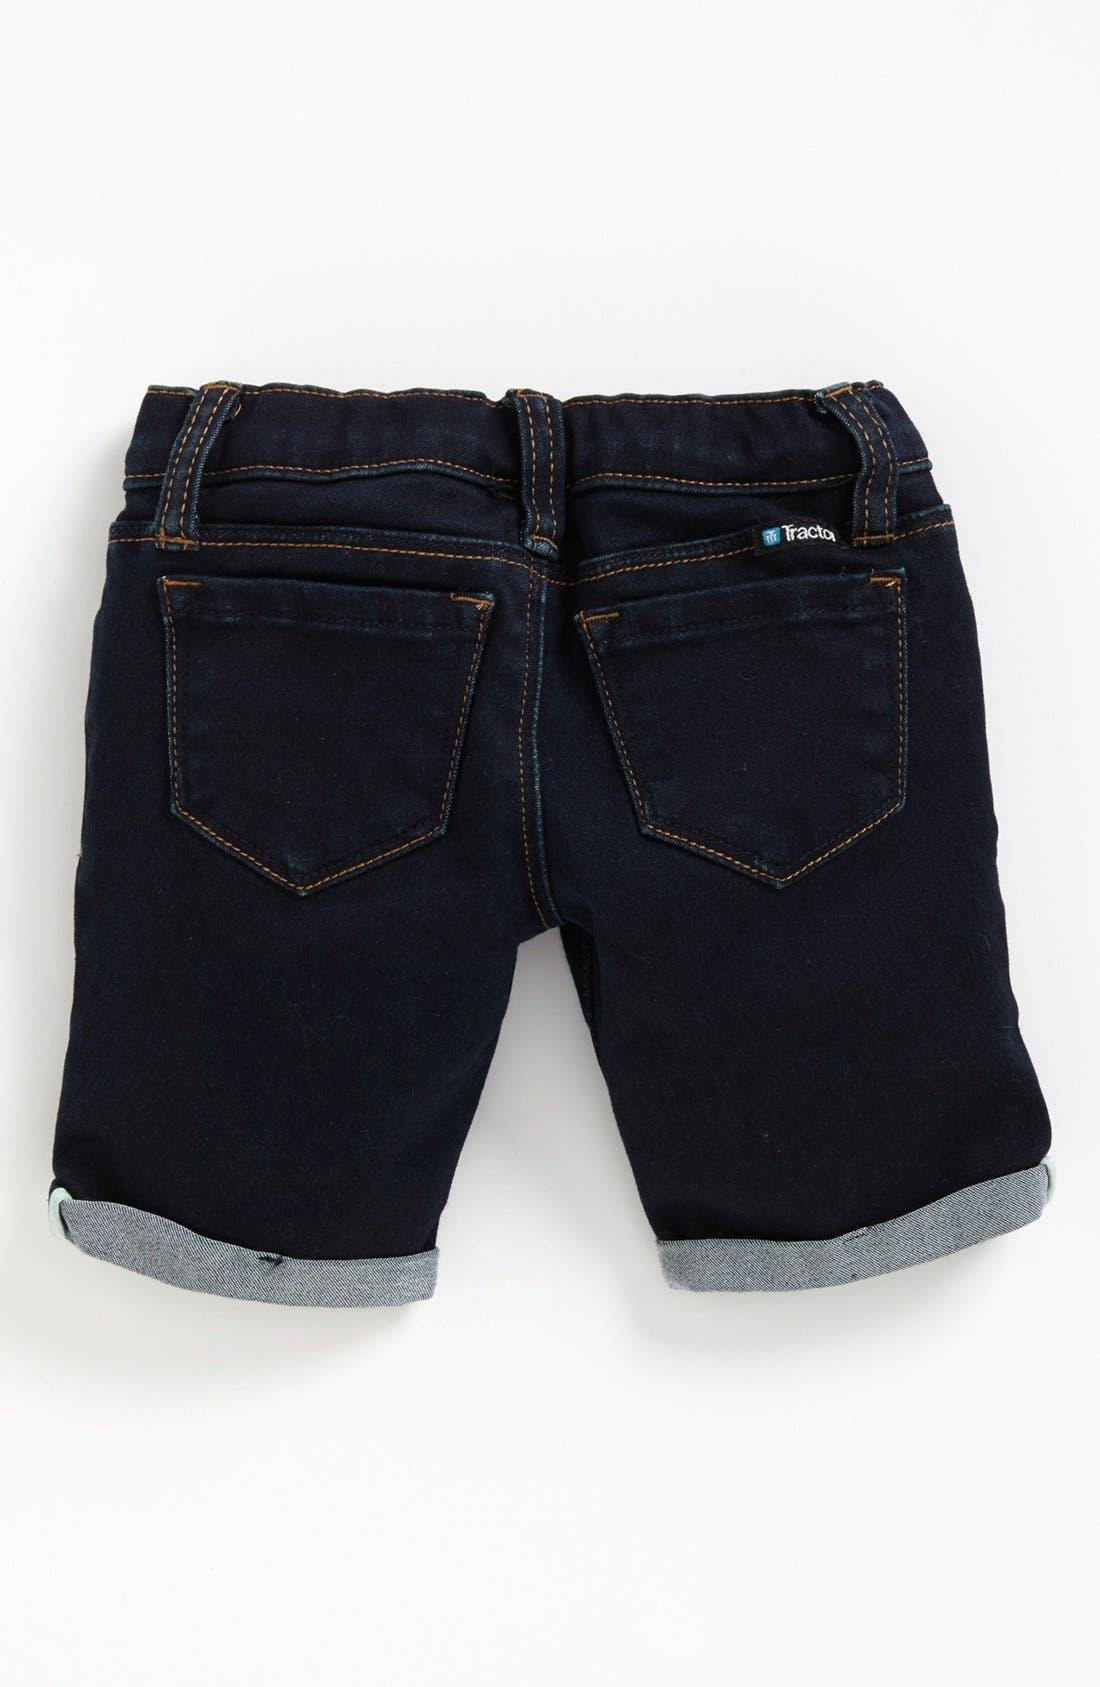 Alternate Image 1 Selected - Tractor Roll Cuff Denim Bermuda Shorts (Big Girls)